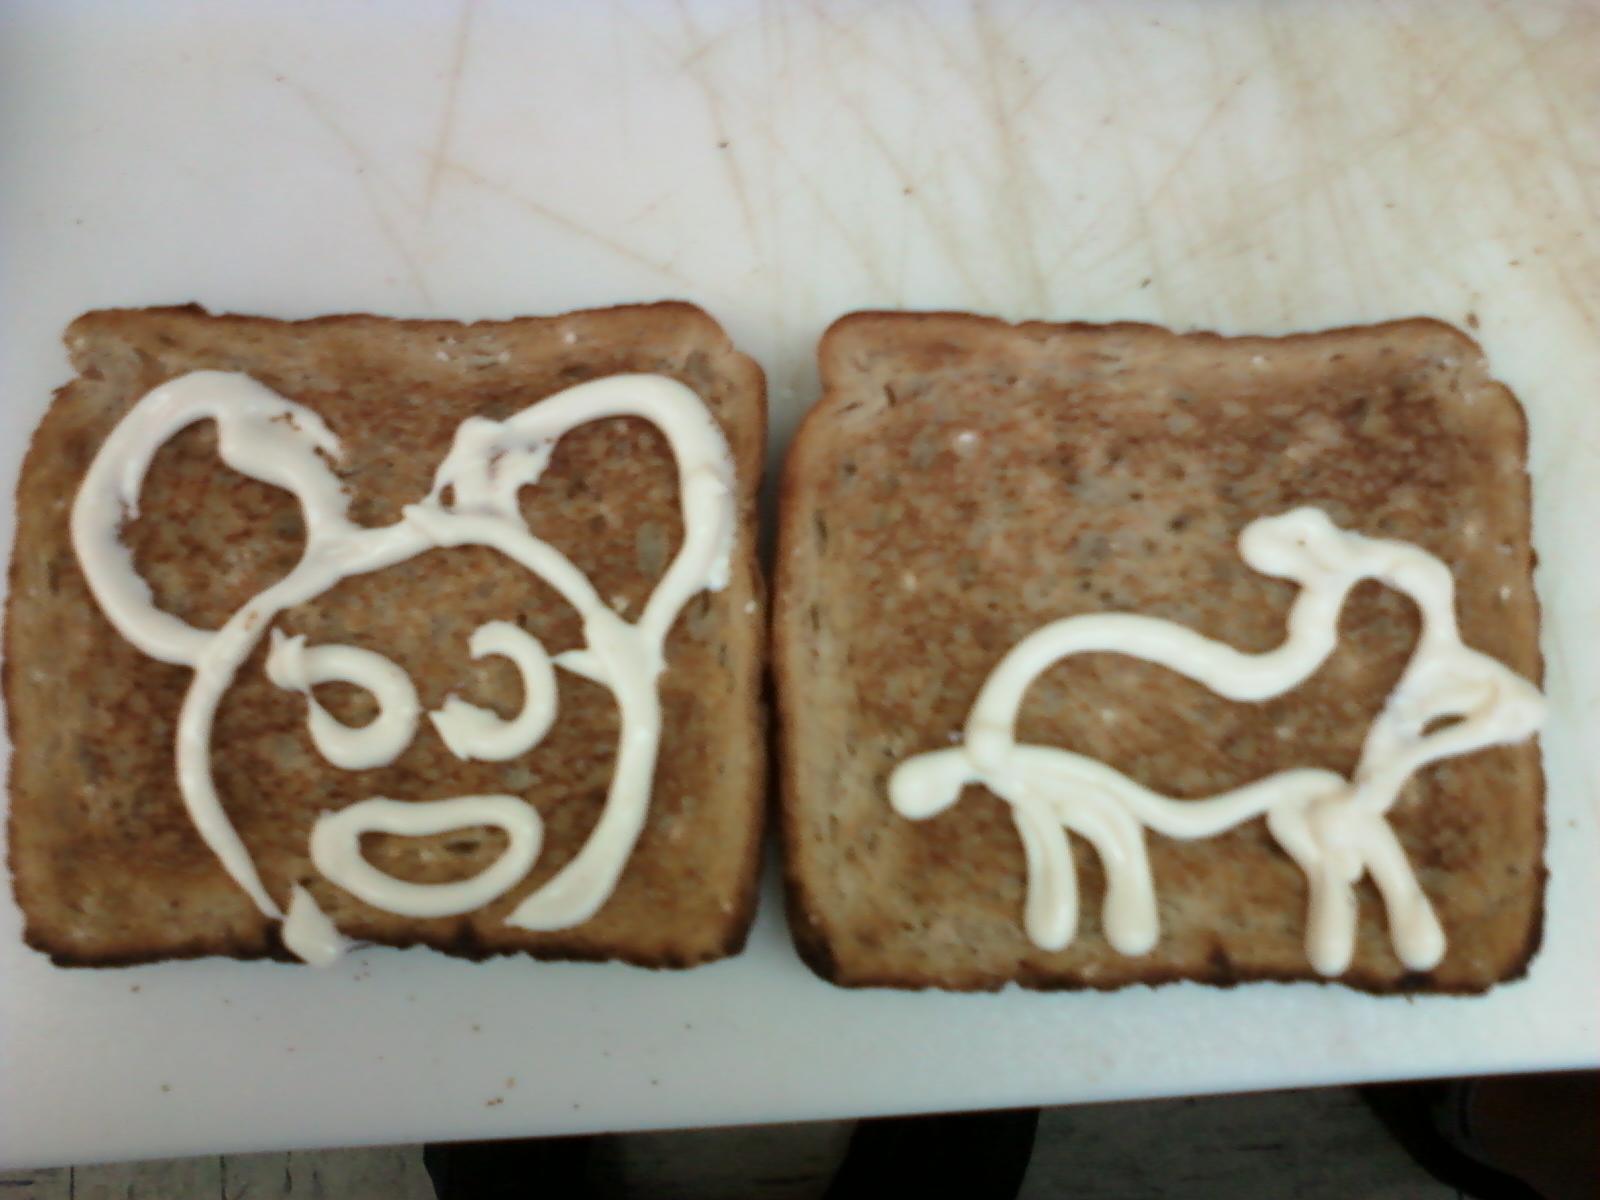 sandwich_art/0823111030.jpg